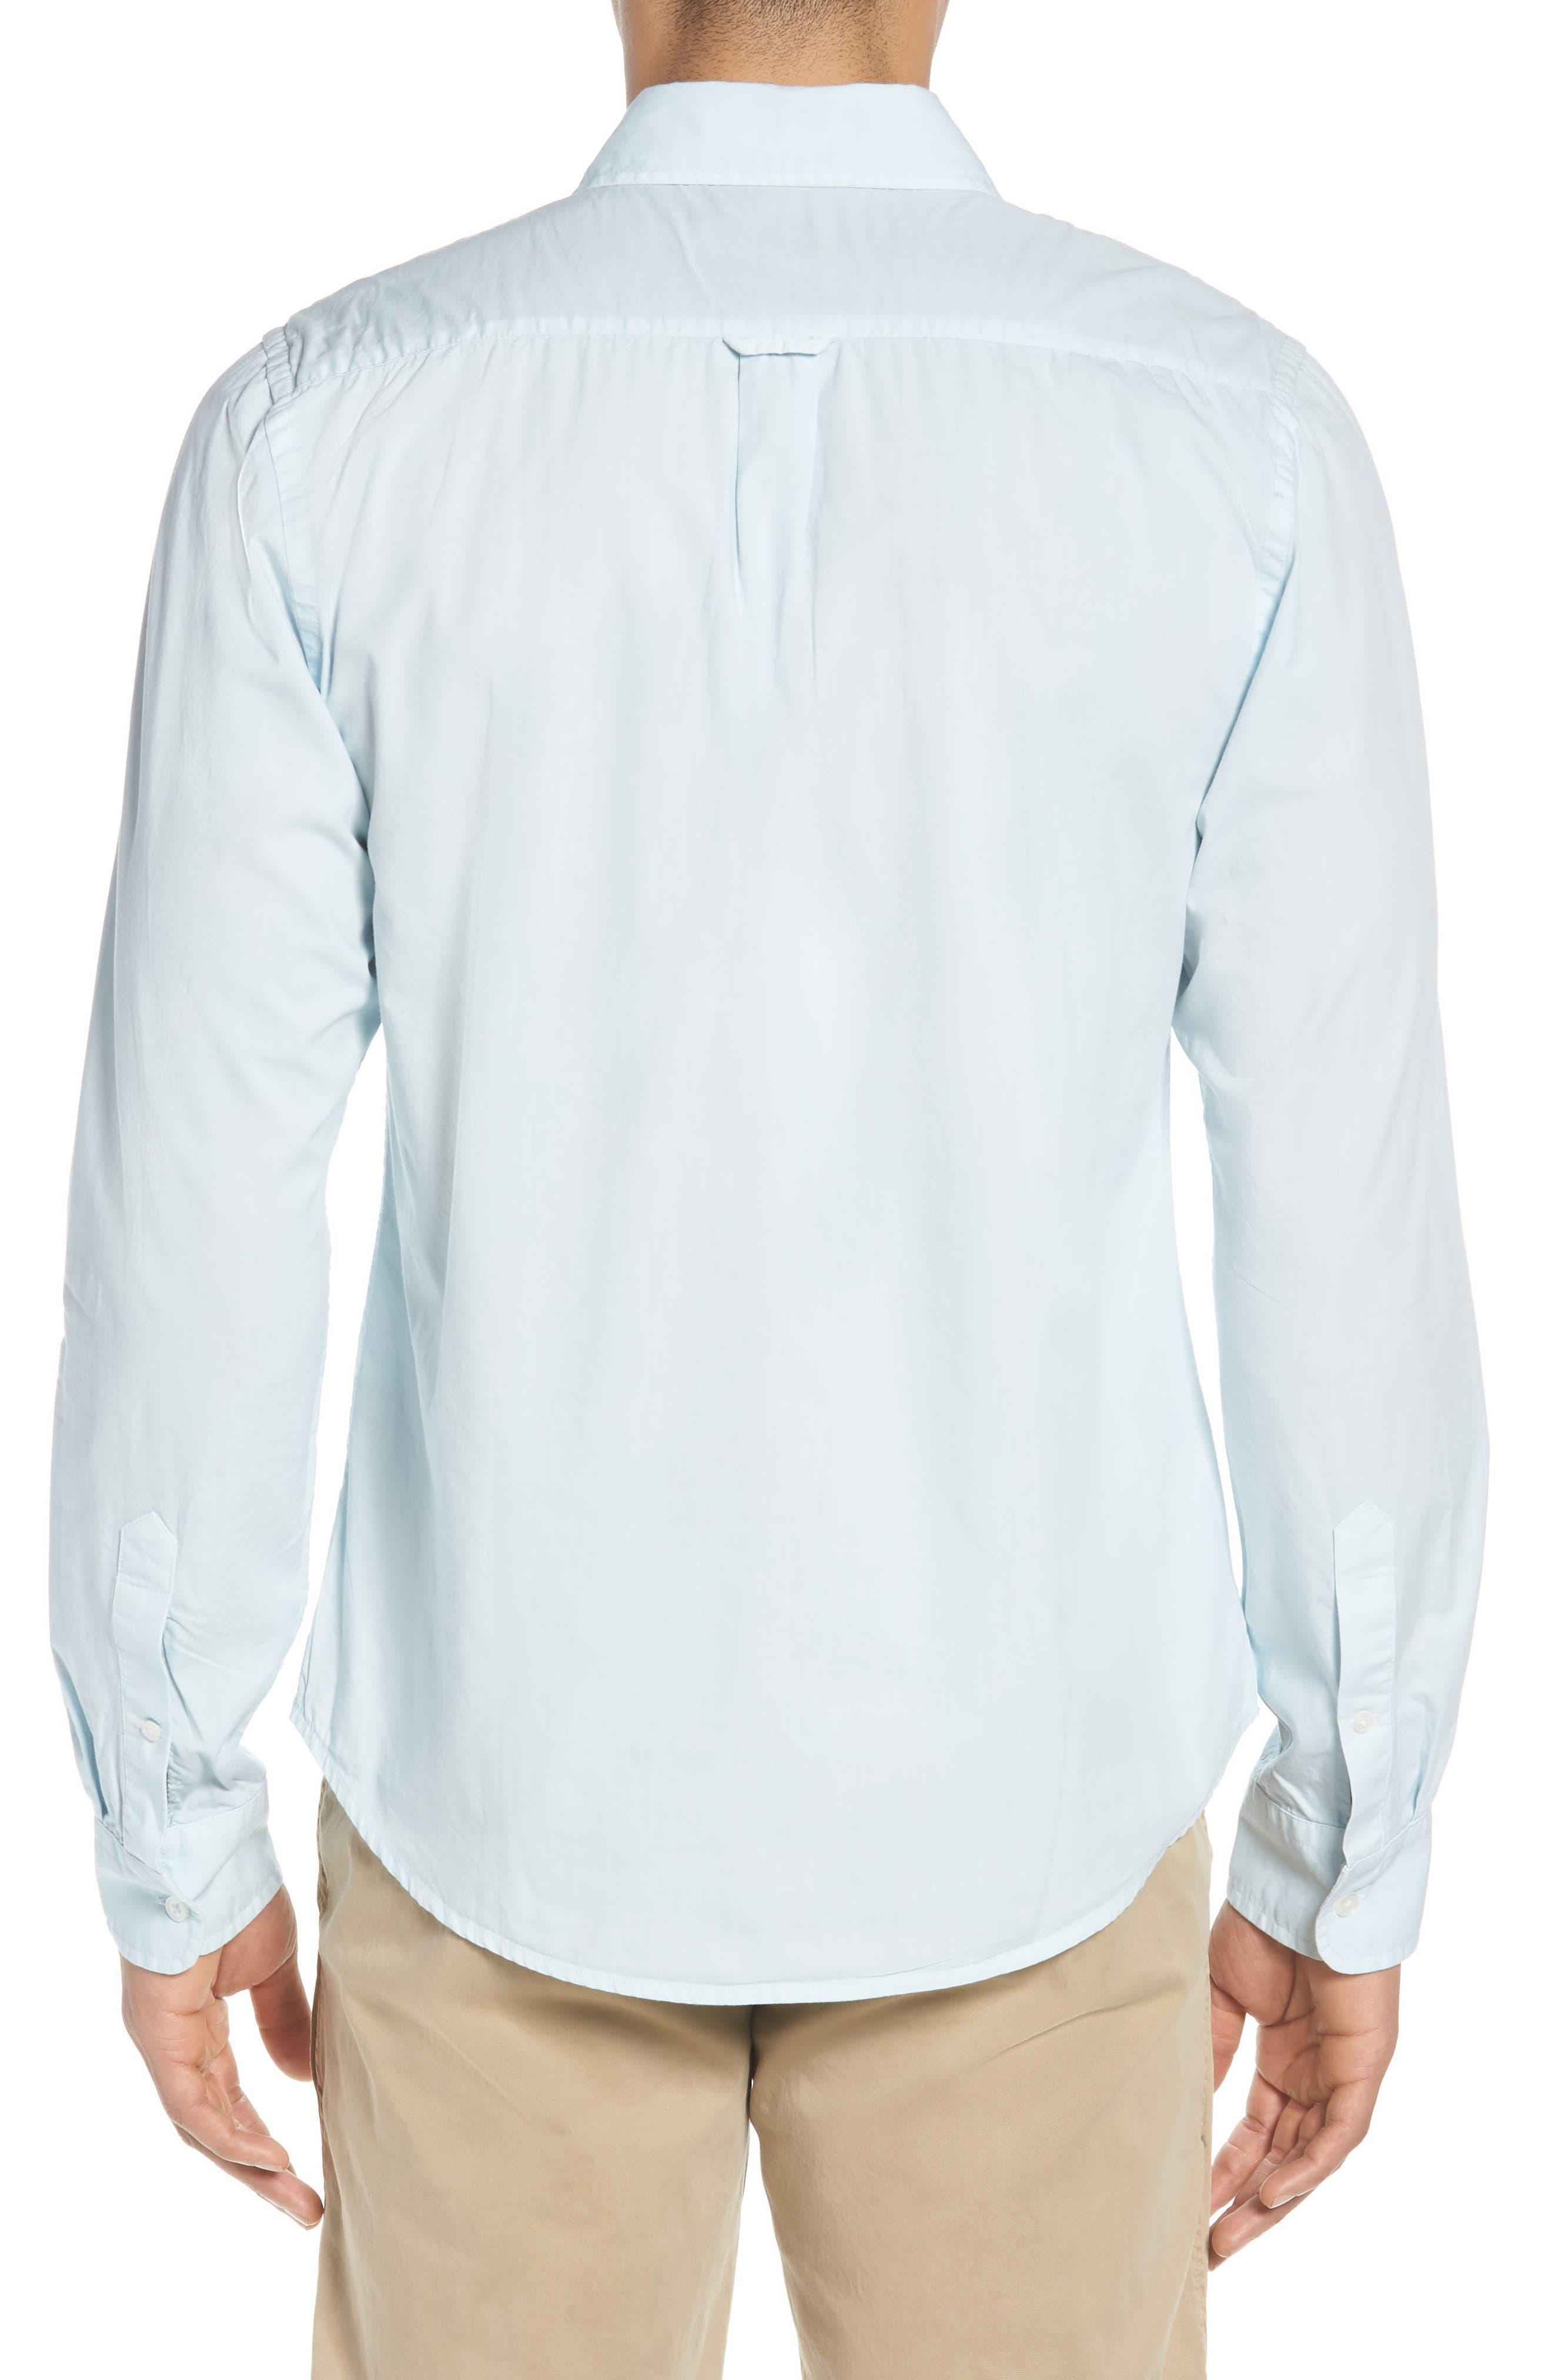 'Naples' Woven Shirt,                             Alternate thumbnail 3, color,                             Waterfall